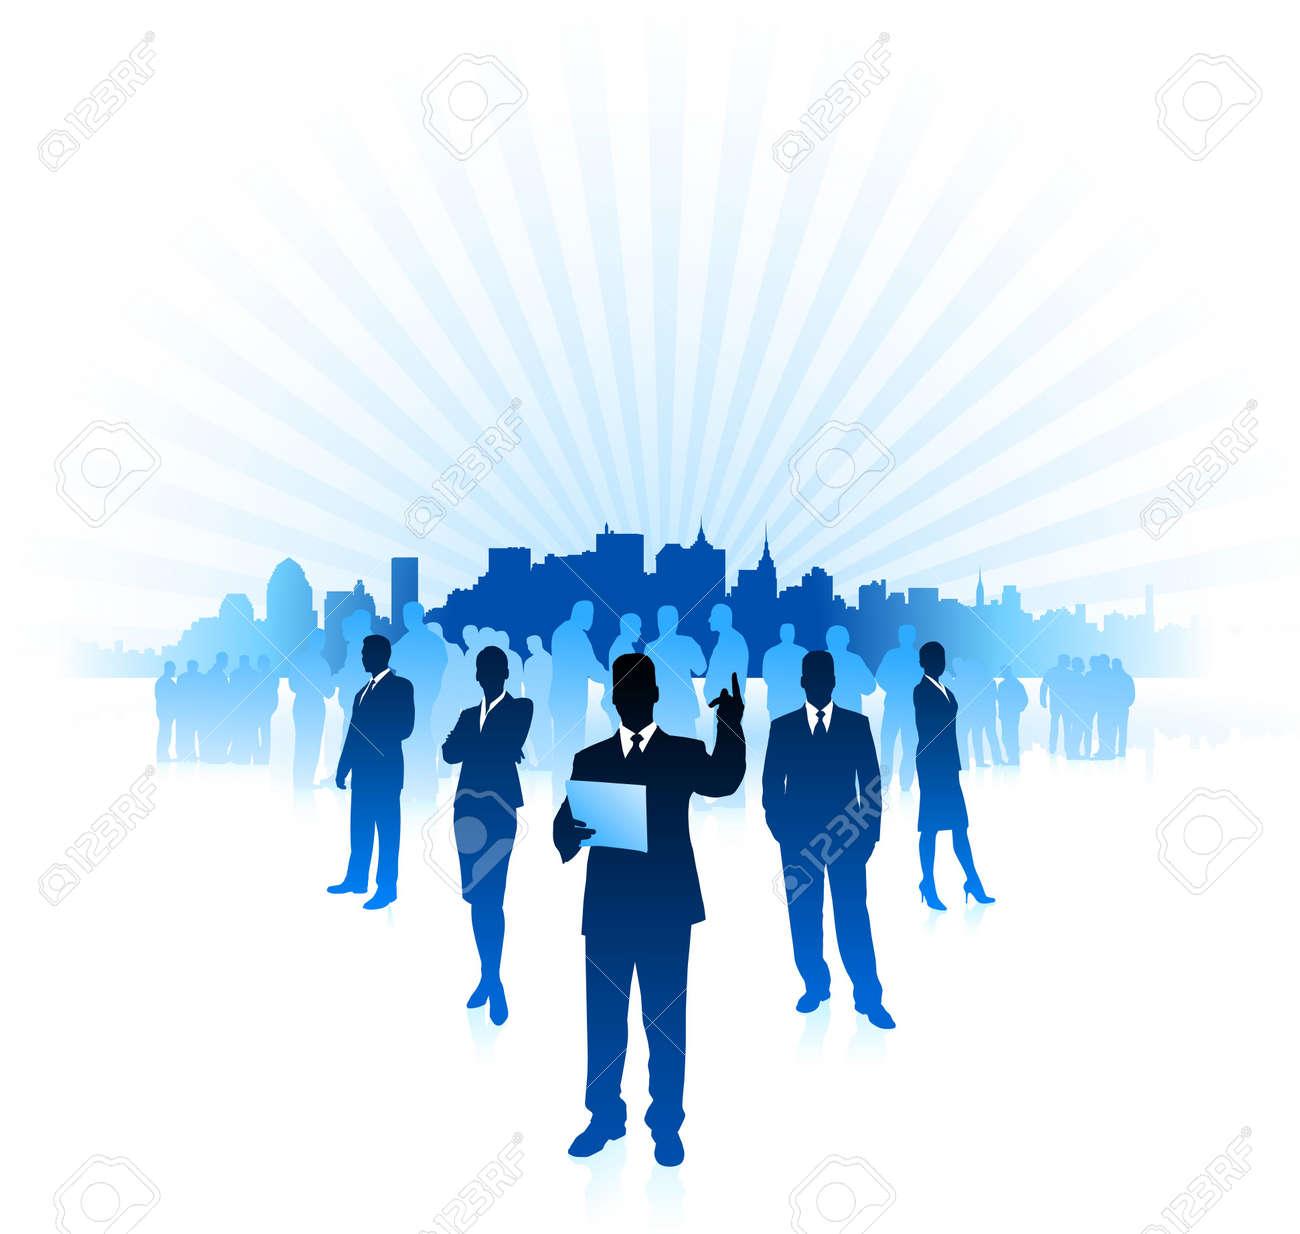 Origianl Illustration: businessman and businesswoman on city skyline internet background File is AI8 compatible Stock Illustration - 6573712